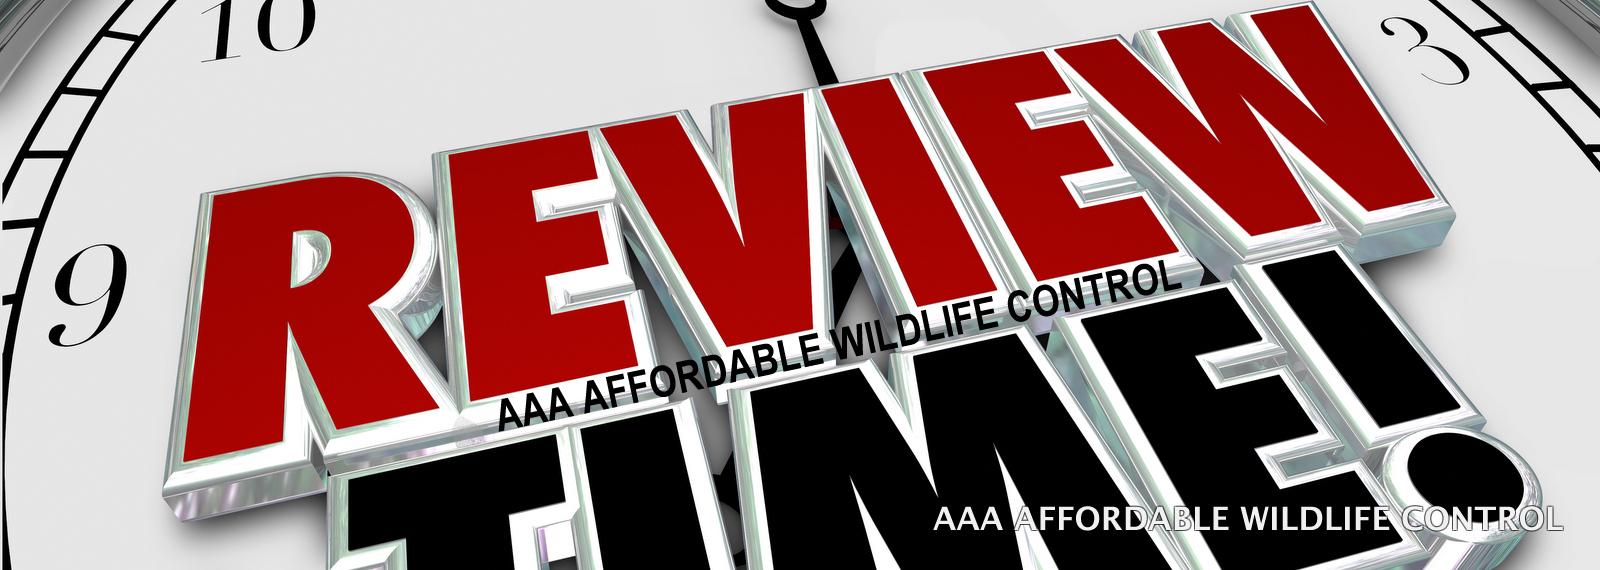 reviews wildlife removal toronto reviews affordable wildlife control